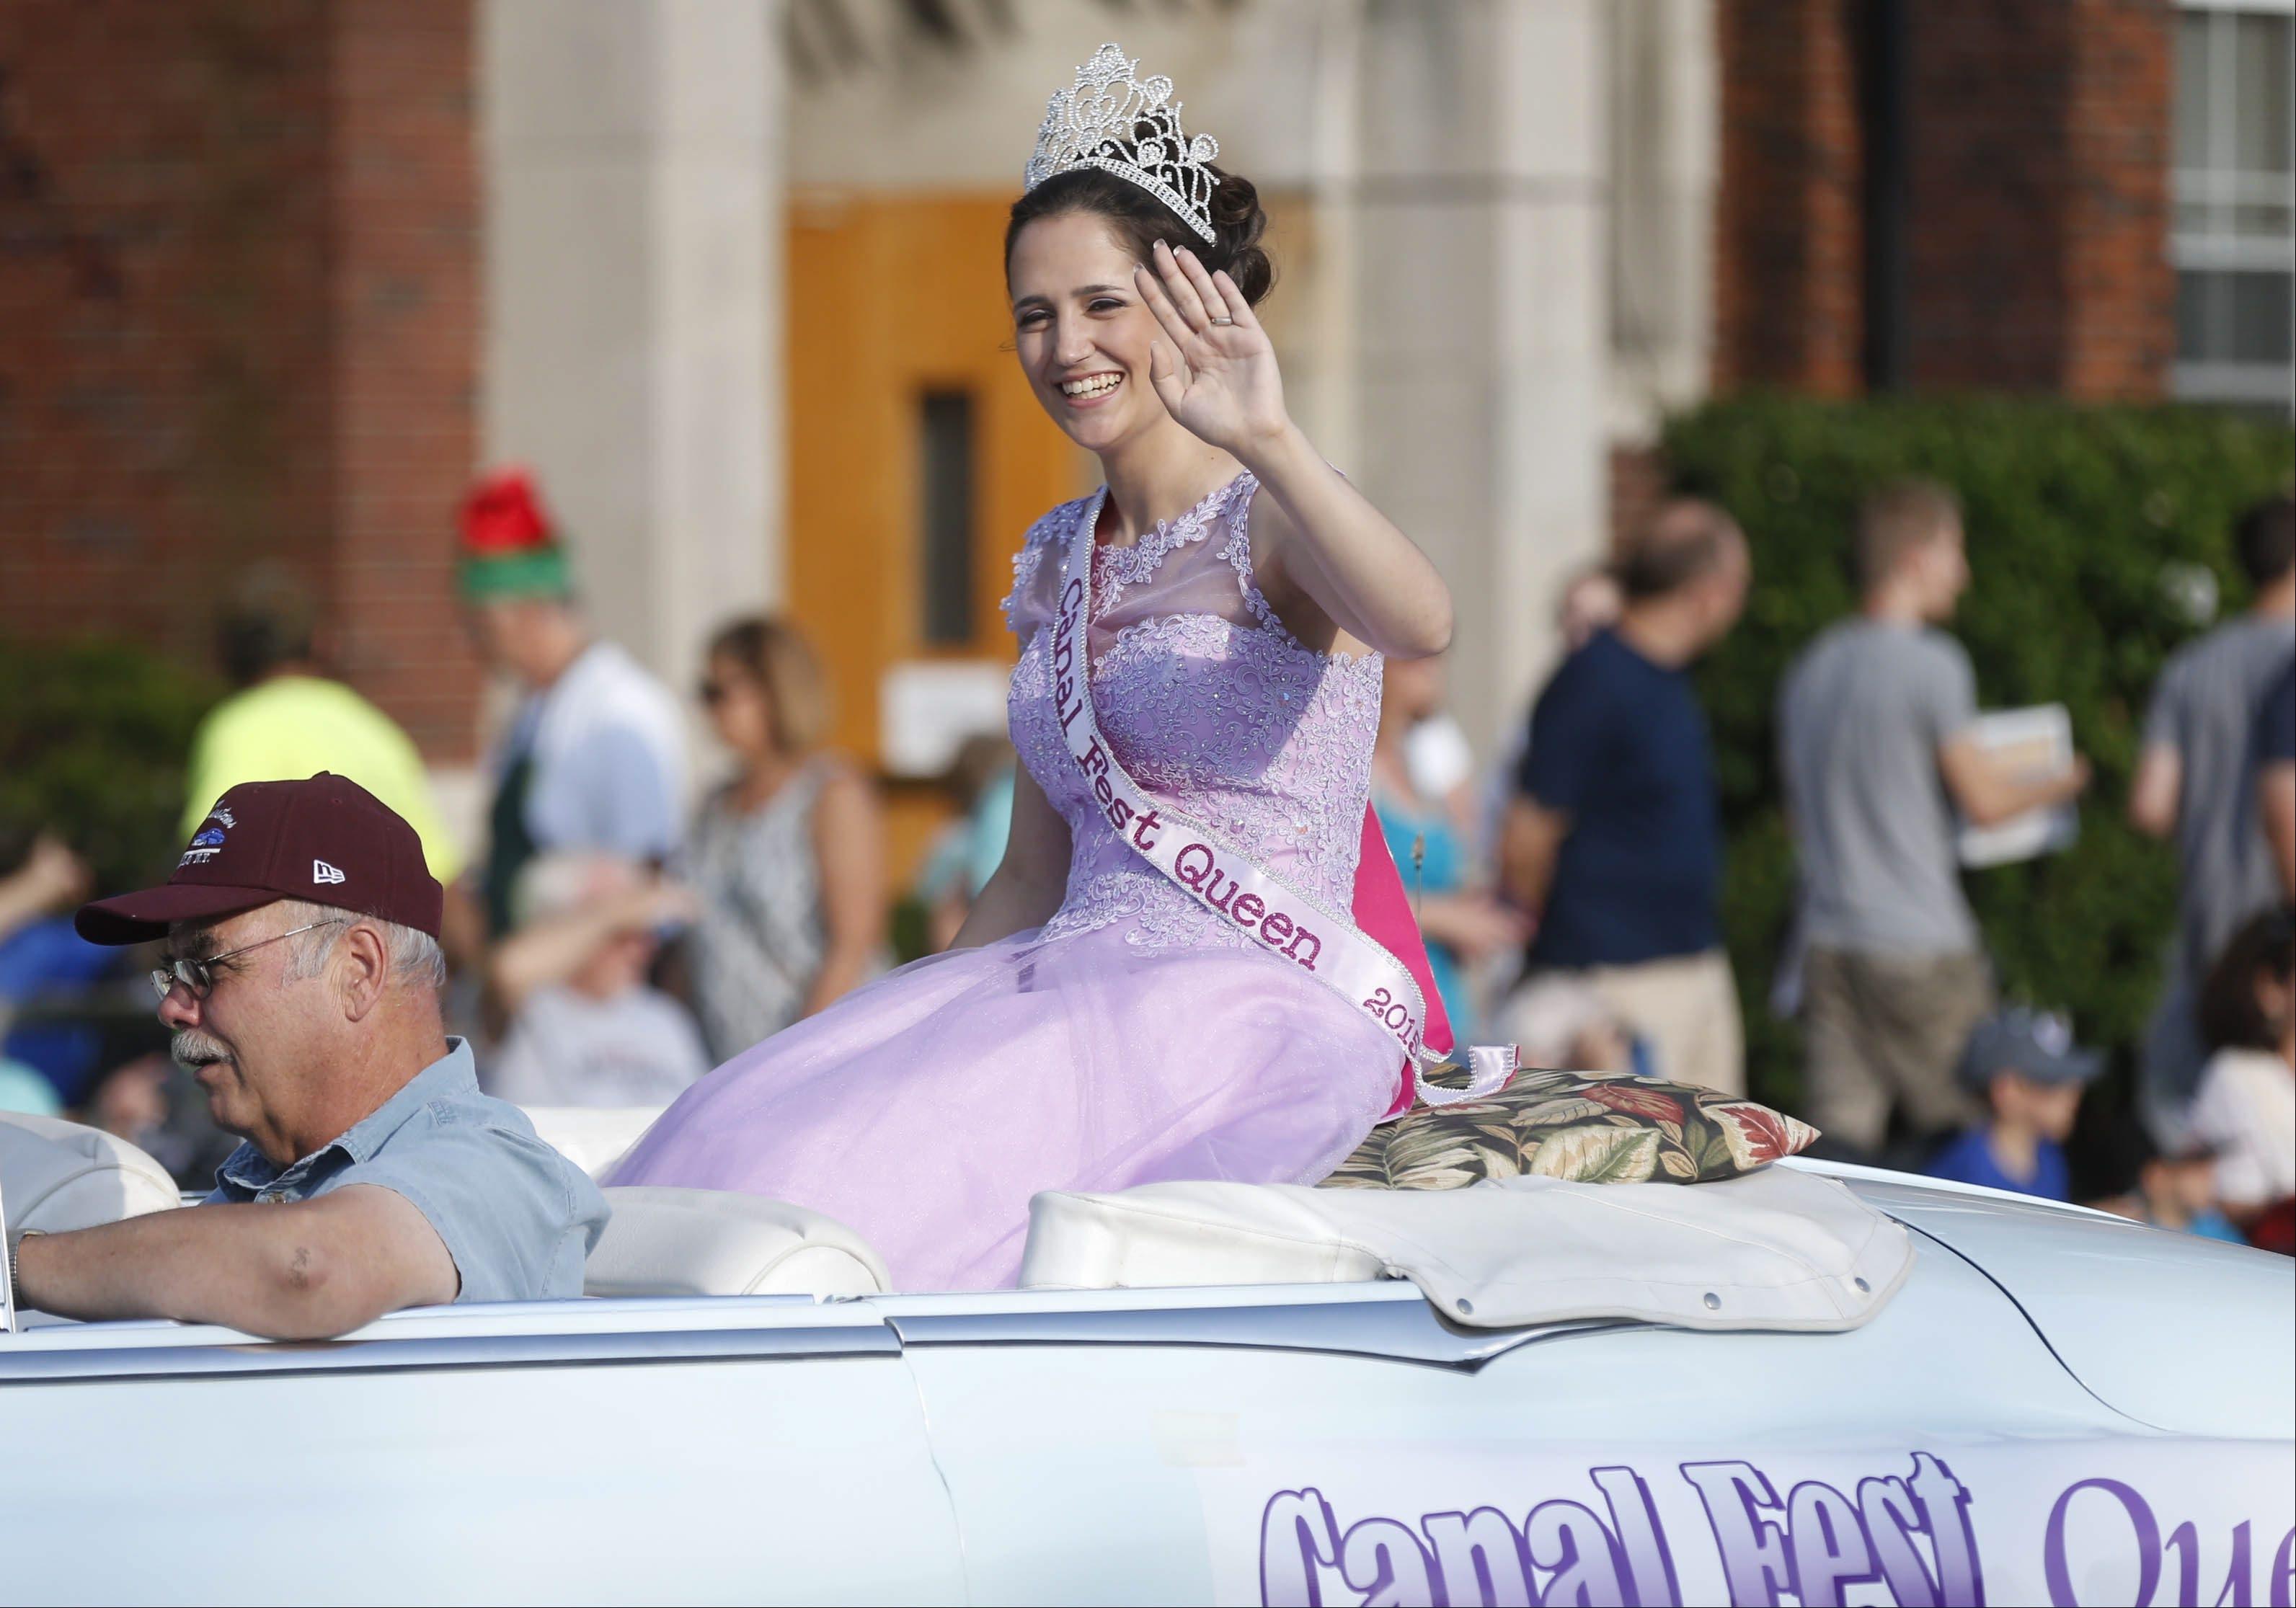 Canal Fest Parade on Tuesday, July 21, 2015.  (Robert Kirkham/Buffalo News)